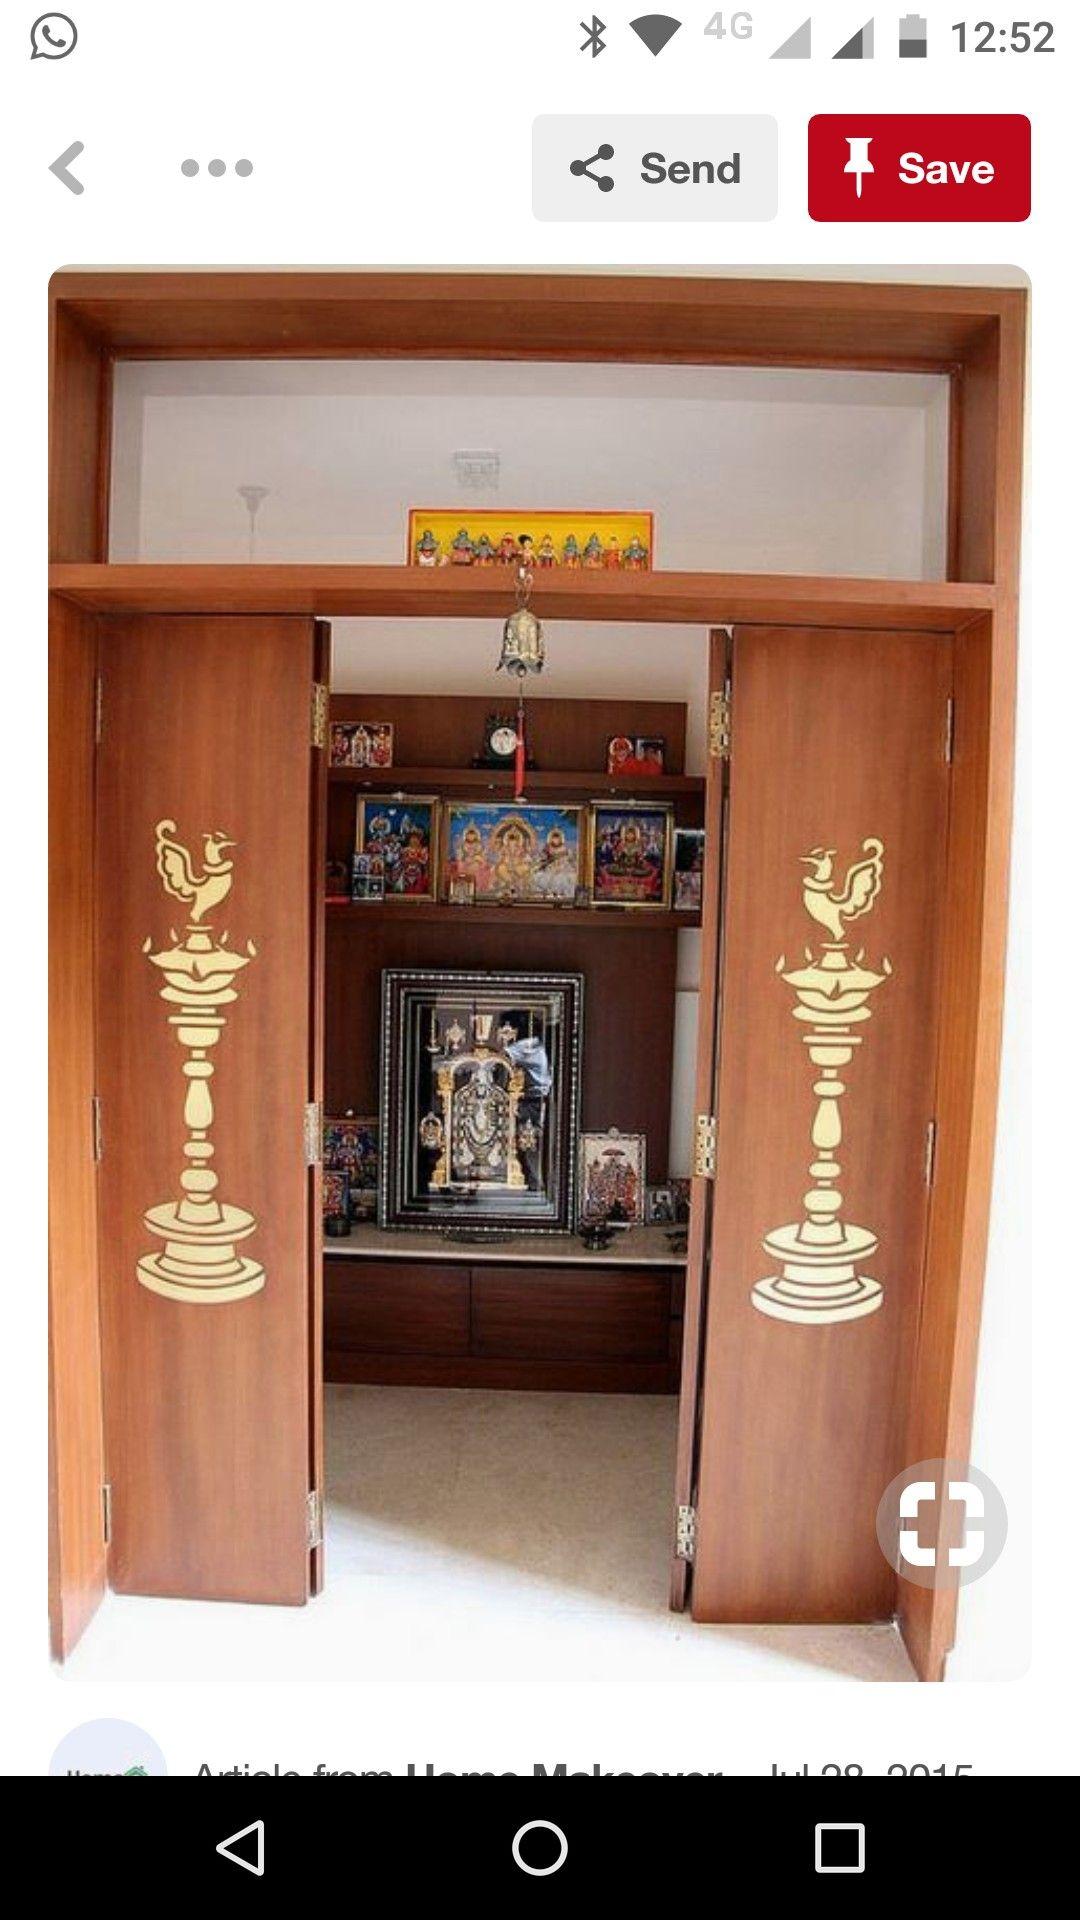 Pooja Room Designs For Flats: Pin By Yogitha Kiran On Pooja Rooms